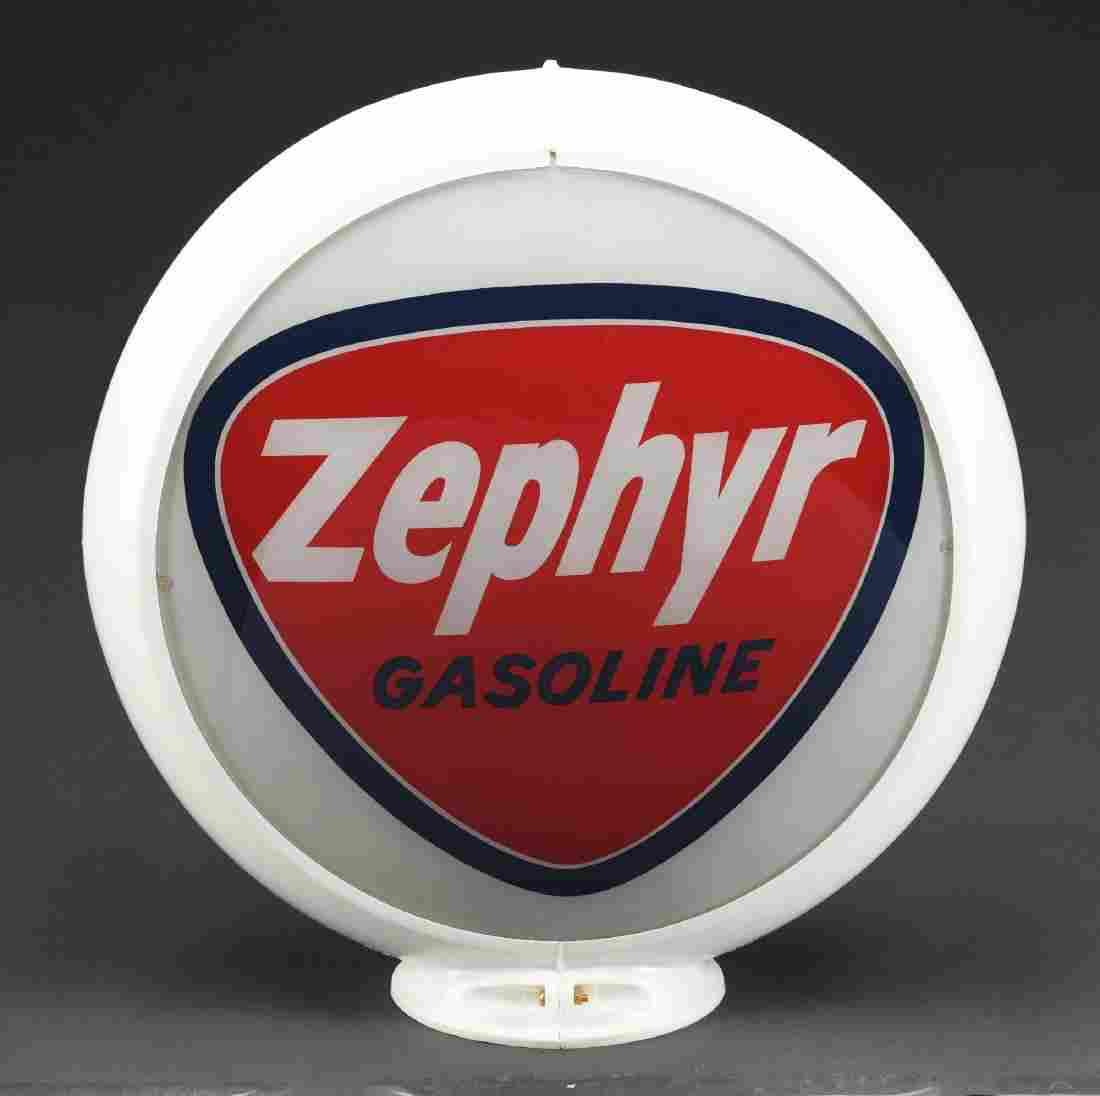 "Zephyr Gasoline Complete 13-1/2"" Globe In Original"